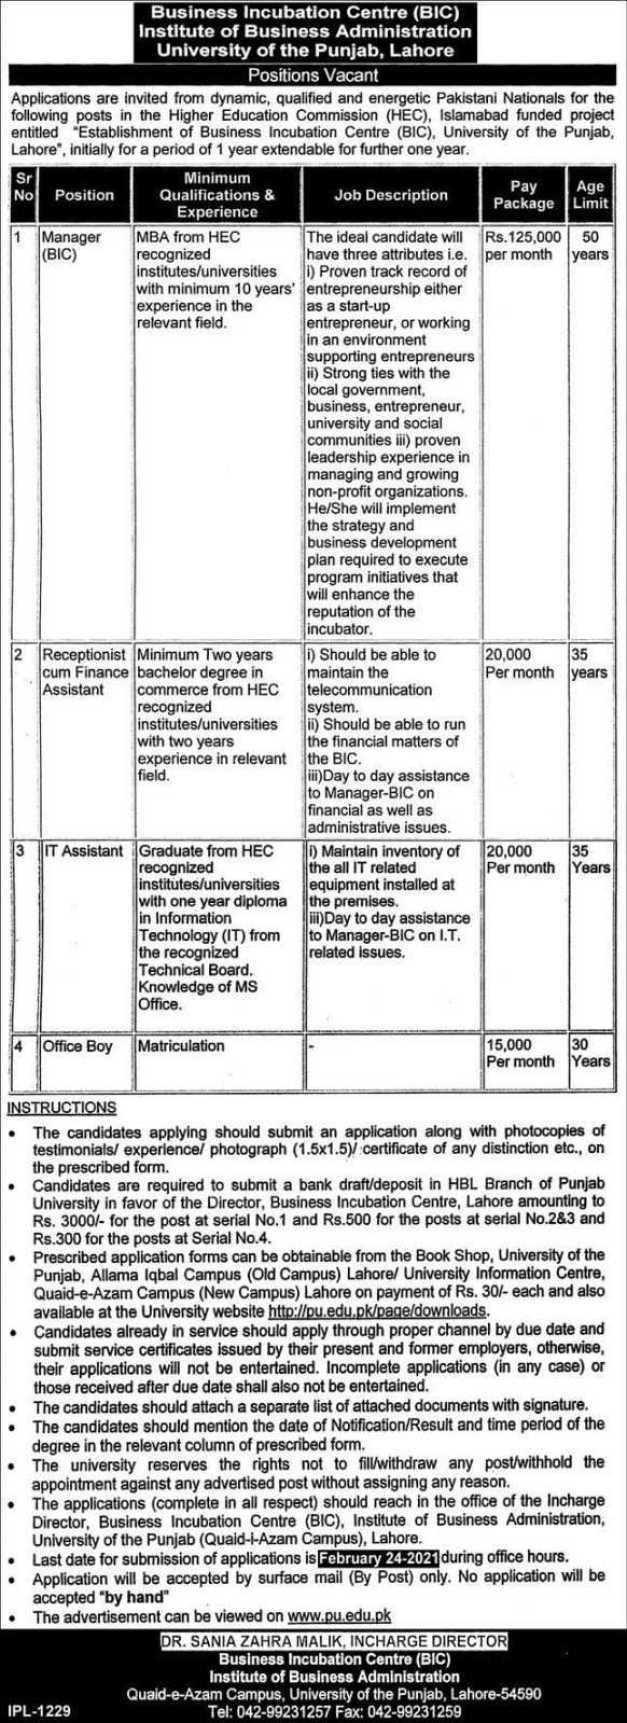 University of Punjab Lahore Jobs 2021